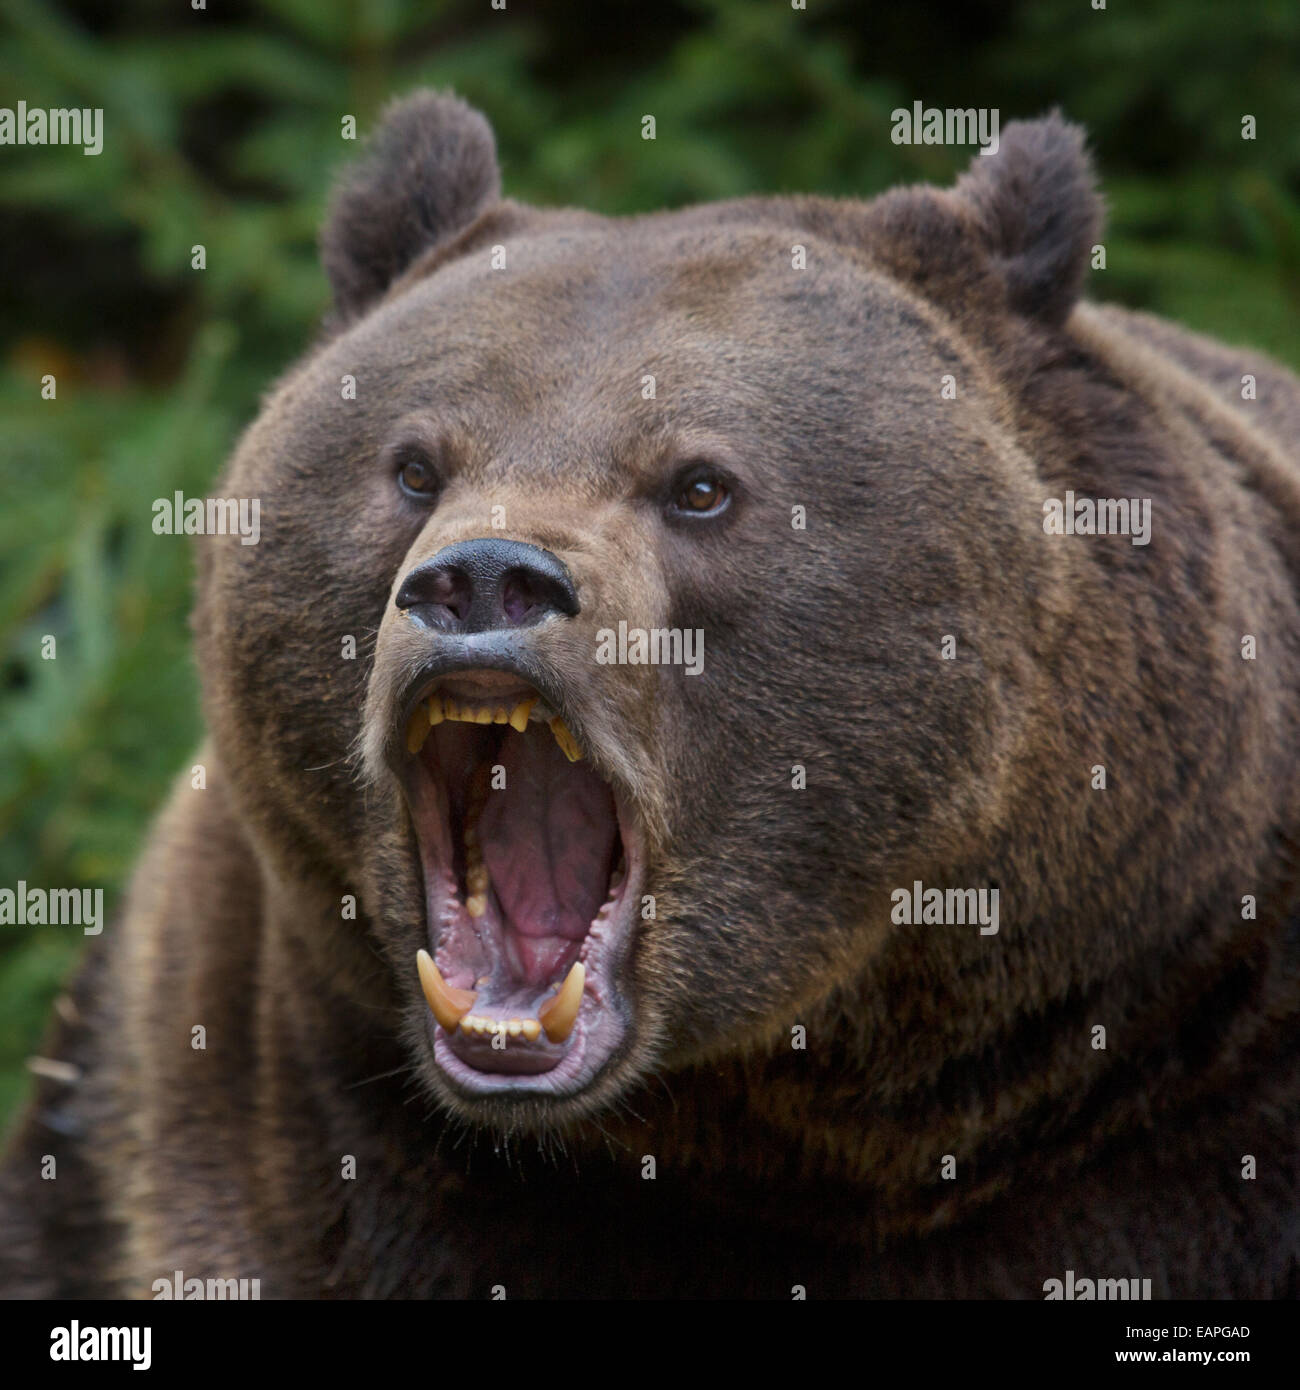 Close up of aggressive European brown bear (Ursus arctos arctos) growling in pine forest - Stock Image